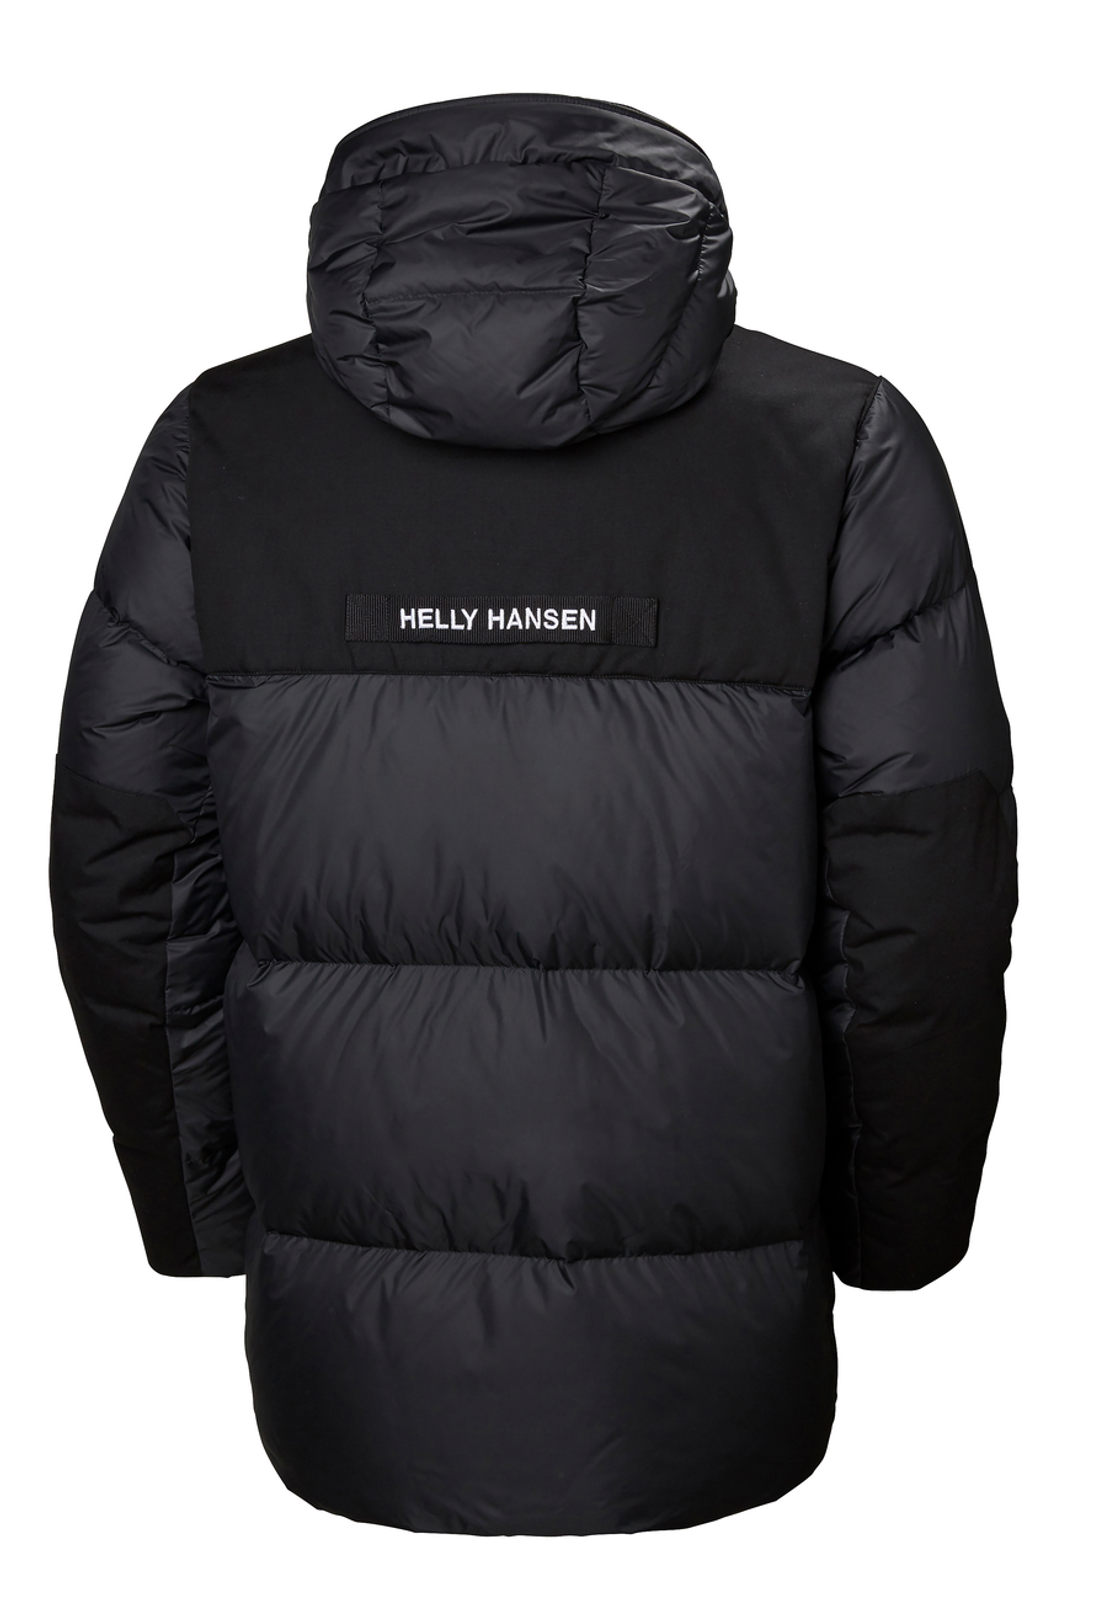 Helly Hansen Arctic Patrol Down Parka, Men's - Black, 53319